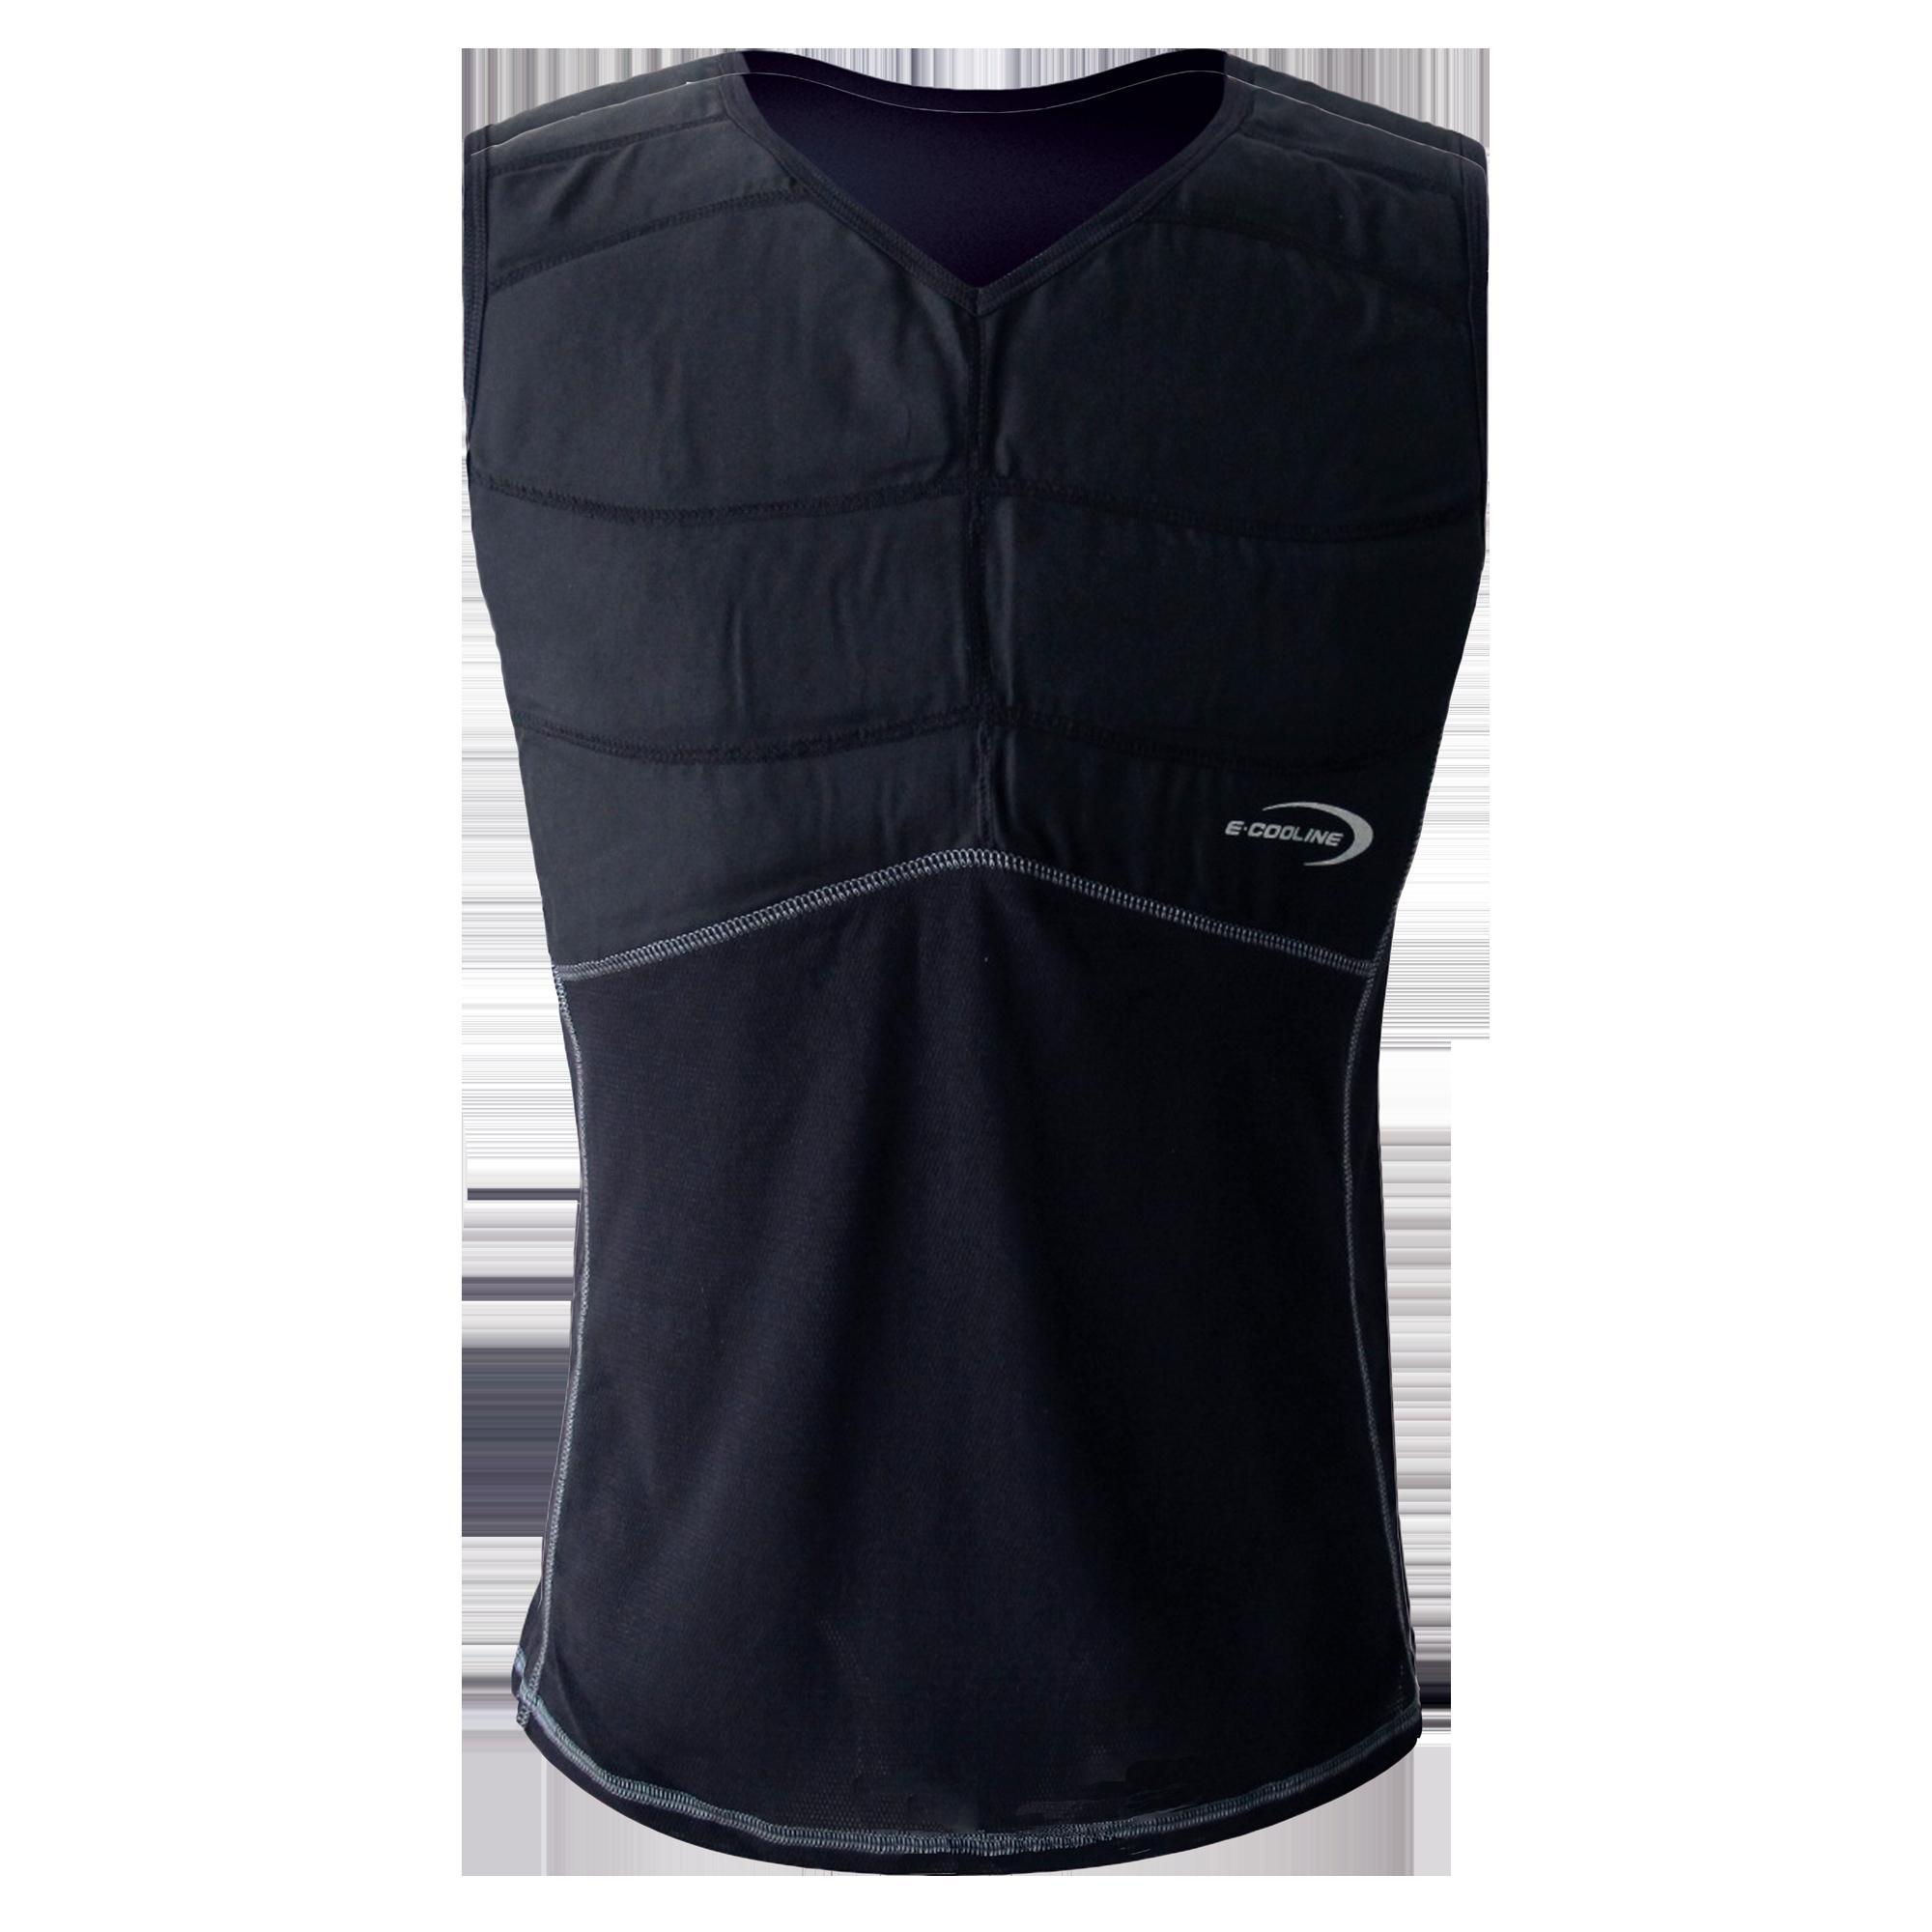 Powercool SX3 cooling Shirt